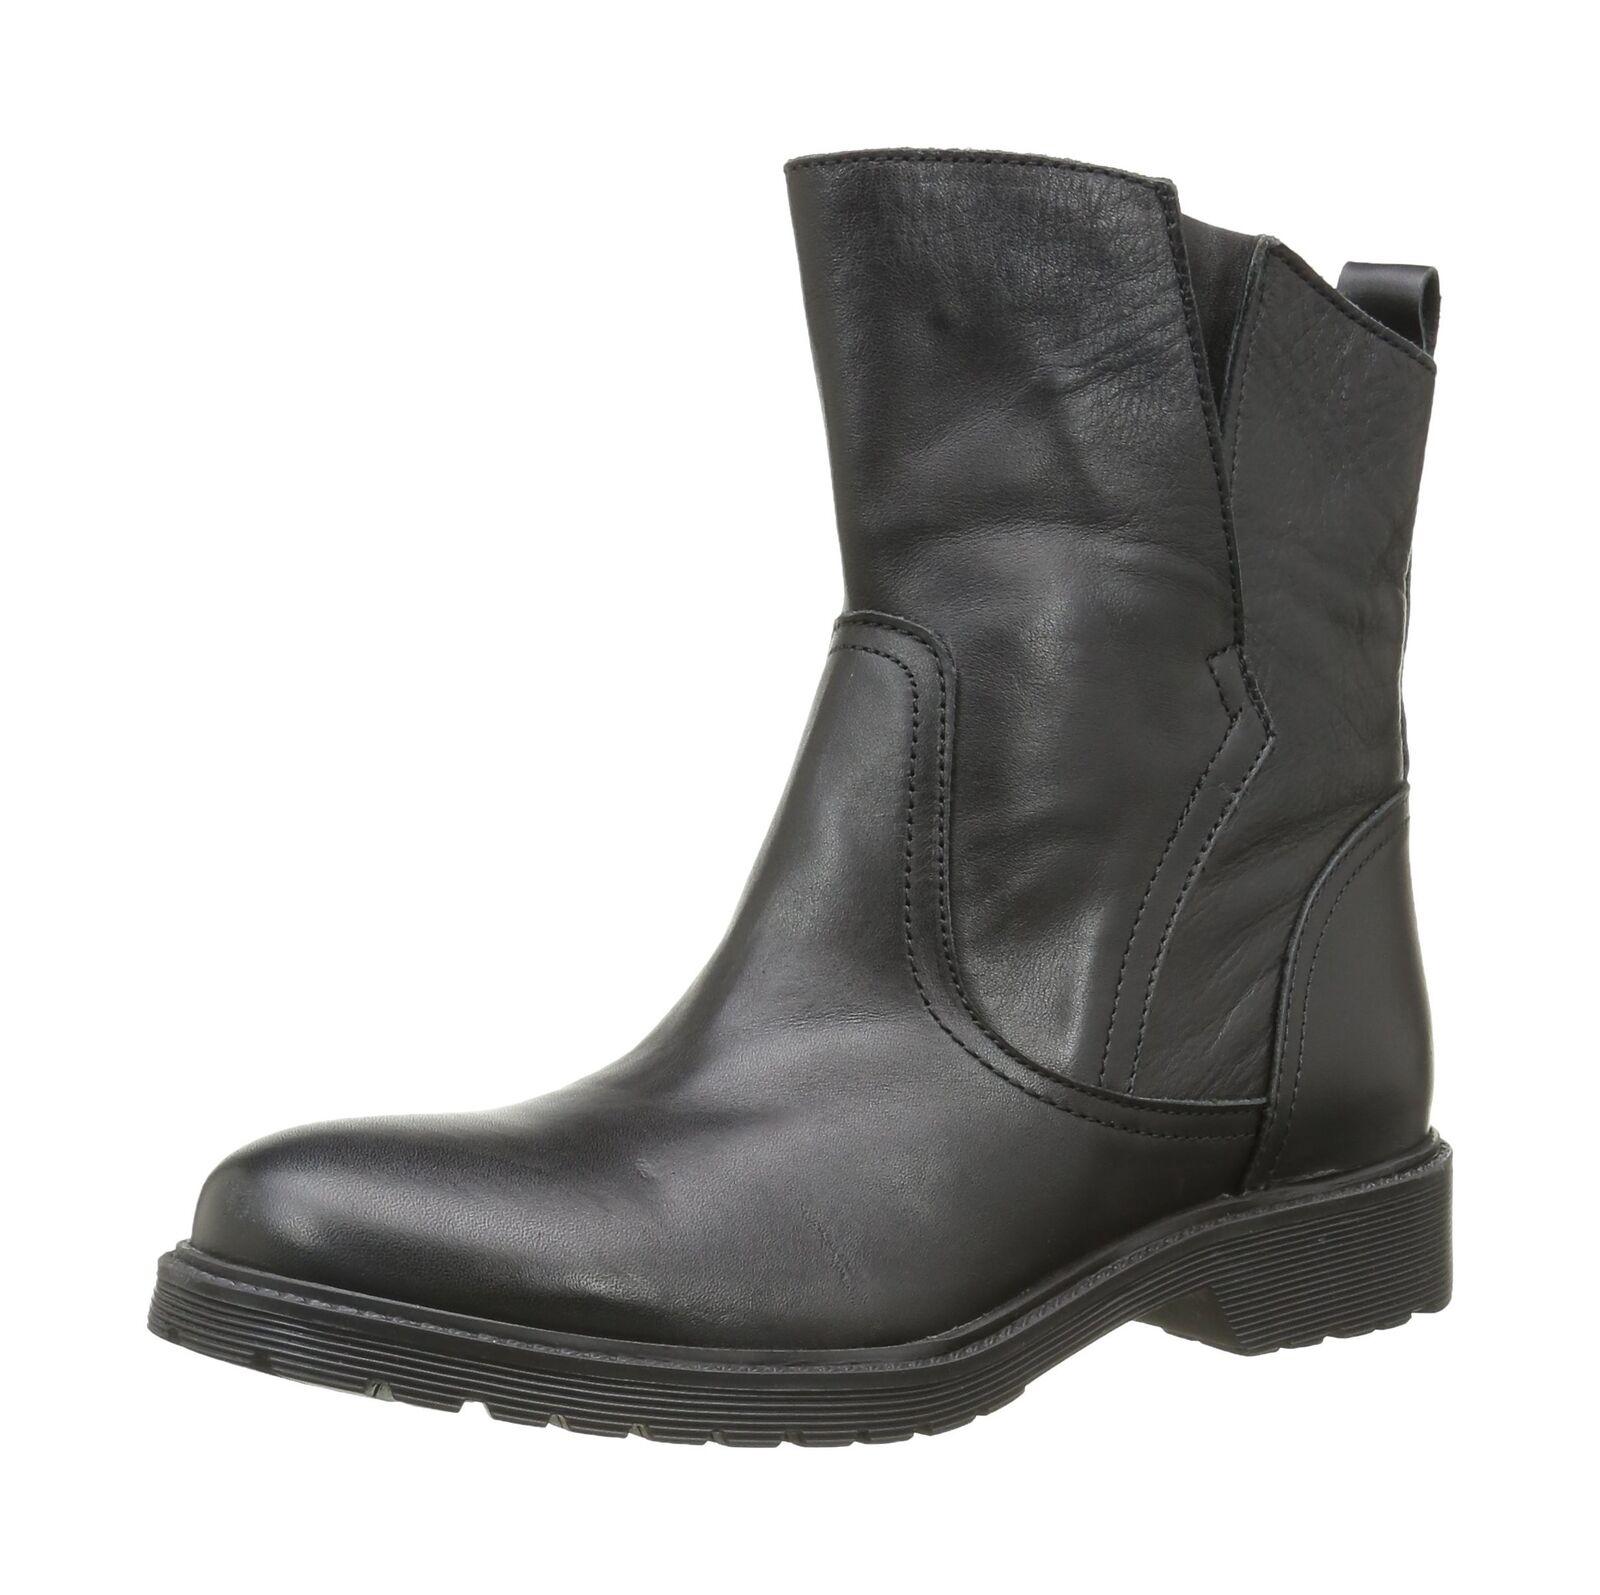 Buffalo para mujer Tobillo de 8036 Antiguo Tobillo mujer Botas Negro (Negro 01 00) 5 Reino Unido 121986